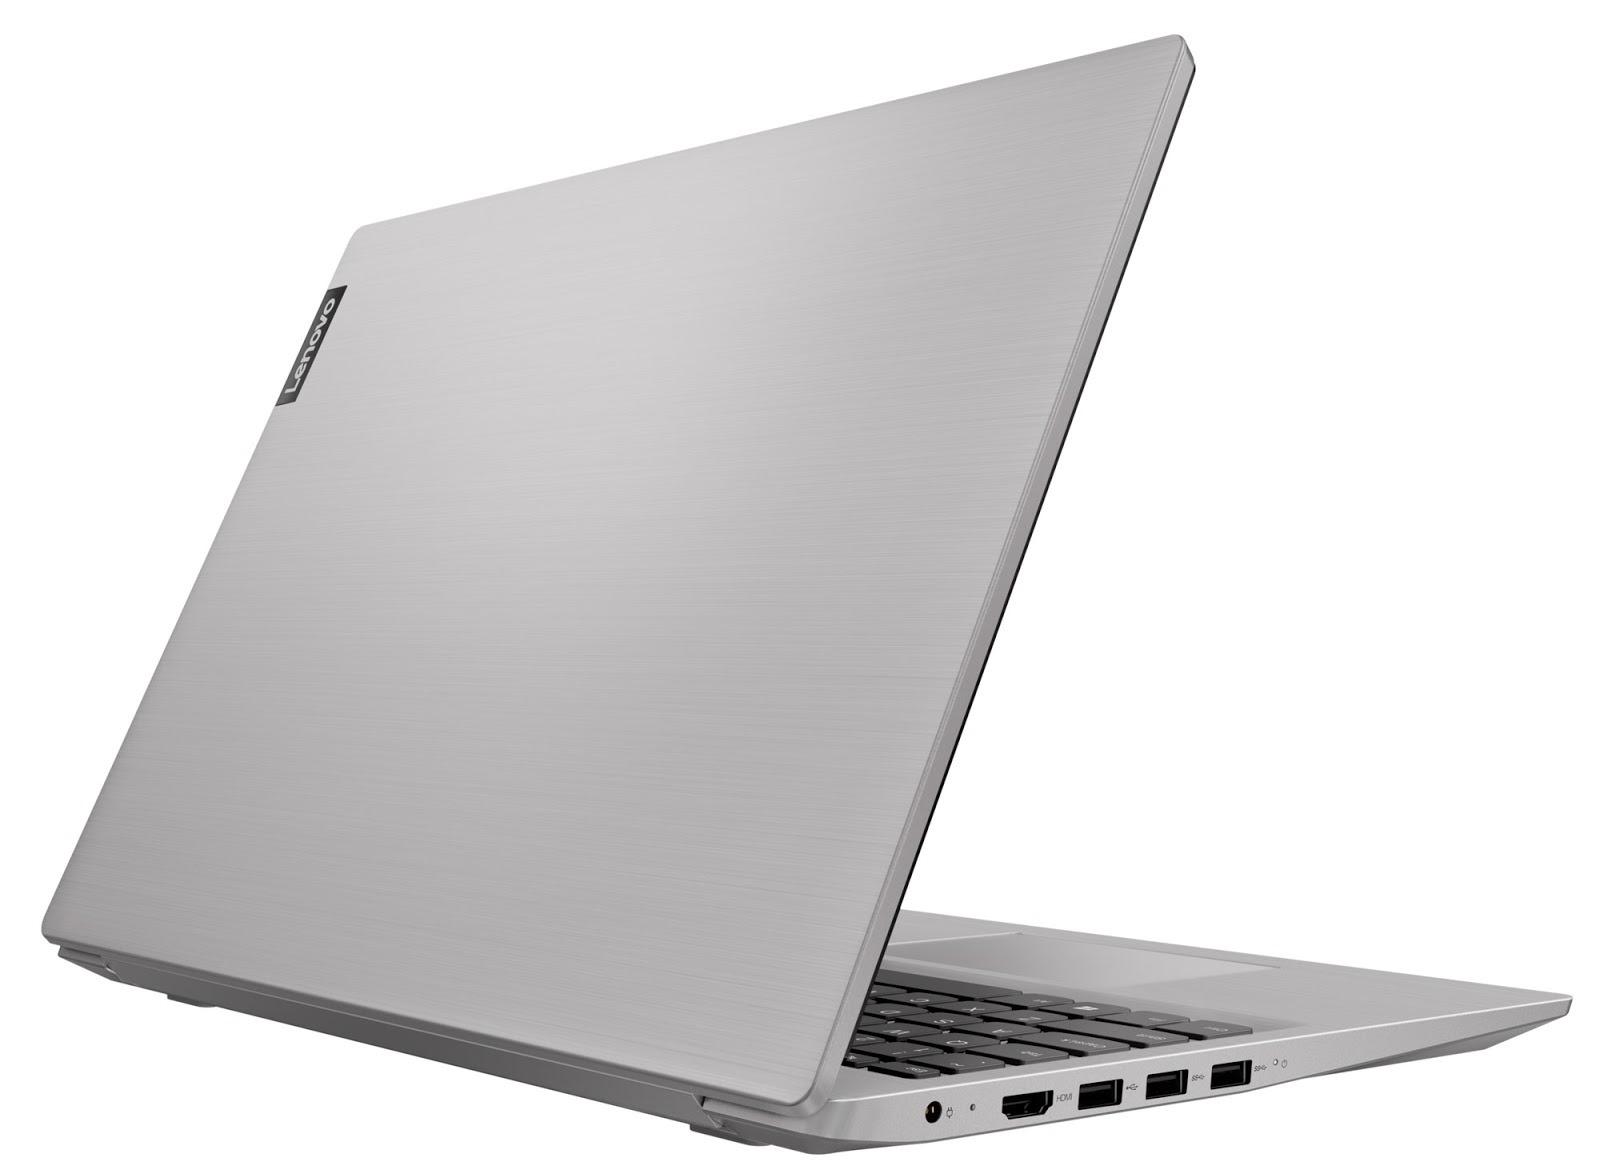 Фото 1. Ноутбук Lenovo ideapad S145-15AST (81N300E9RE)